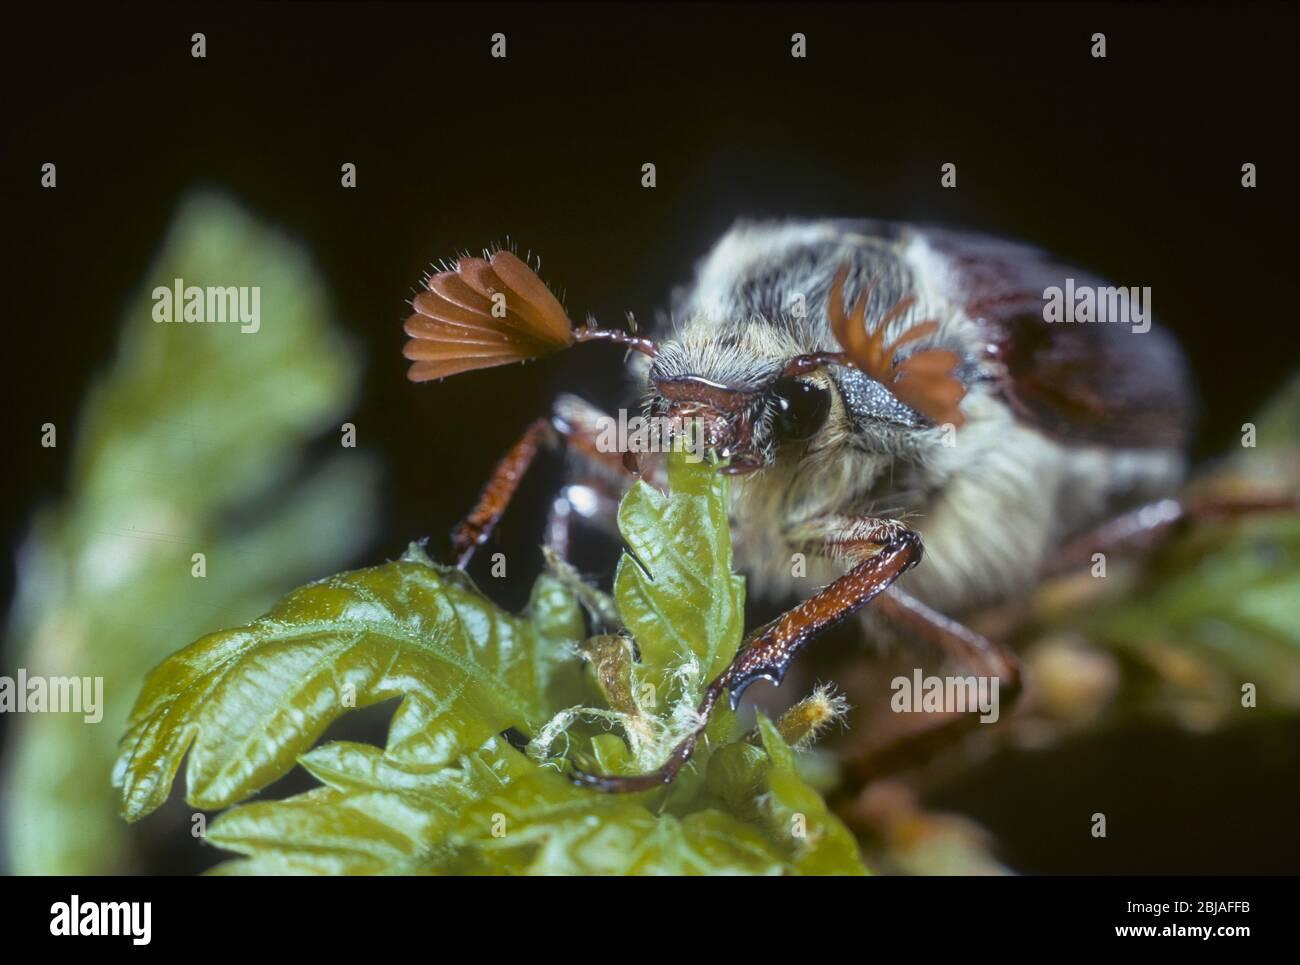 Cockchafer común, maybug, Maybeetle (Melolontha melolontha), alimentándose en roble, Alemania Foto de stock